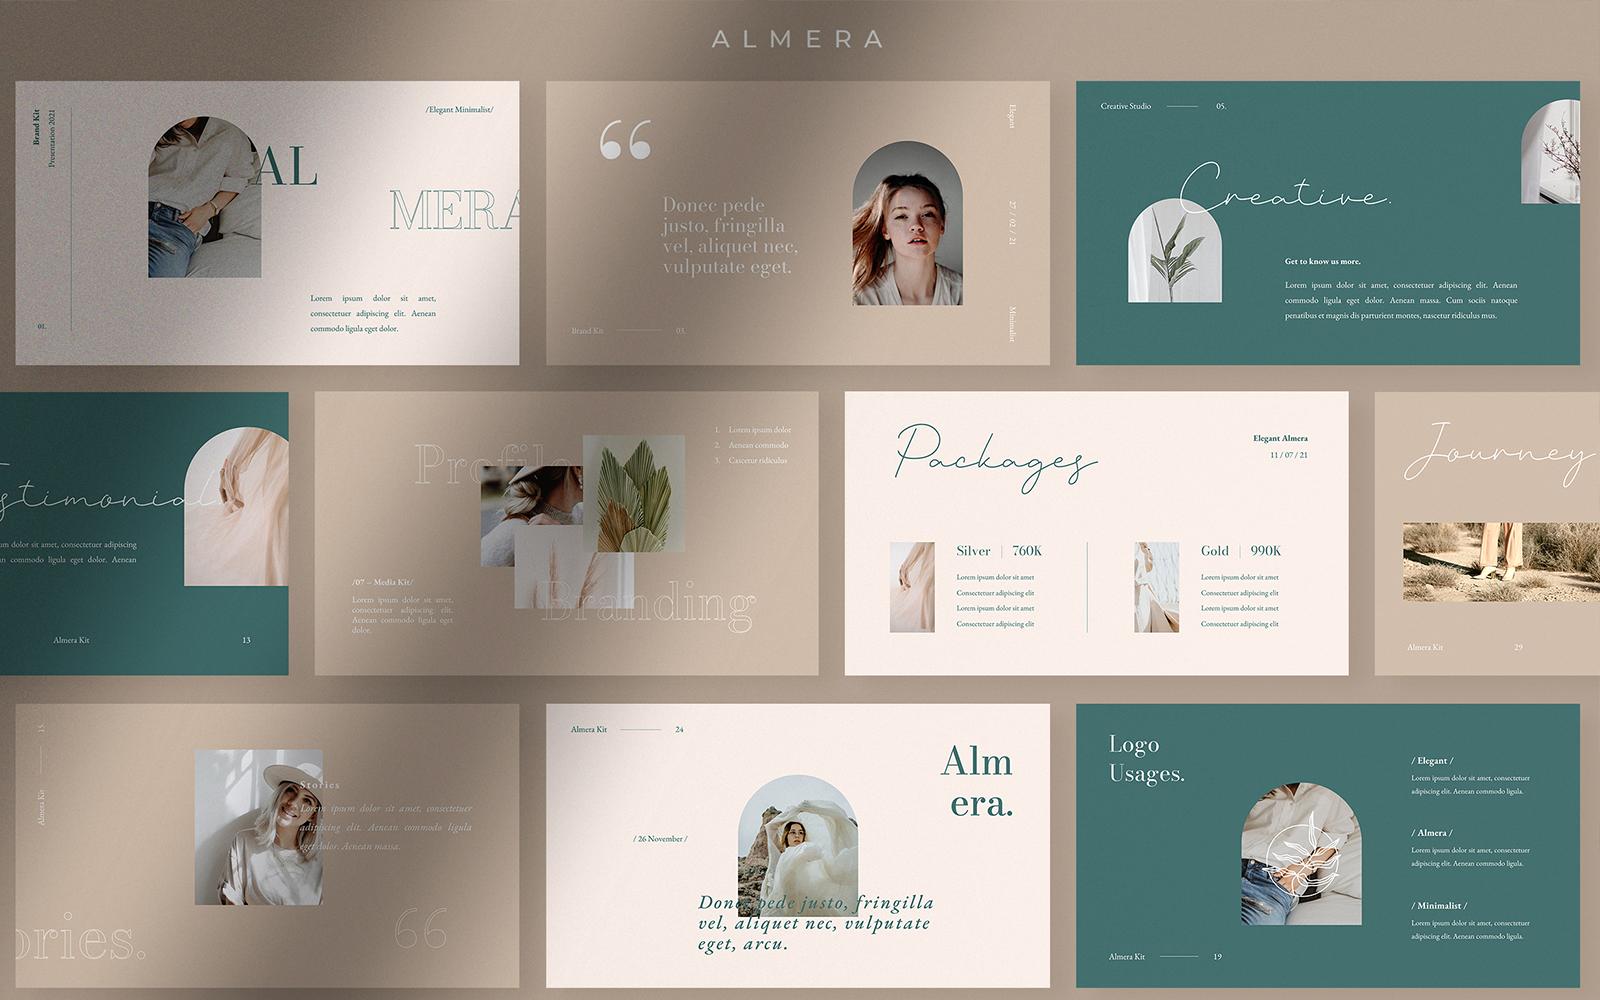 Almera - Brand Kit Presentation PowerPoint Template